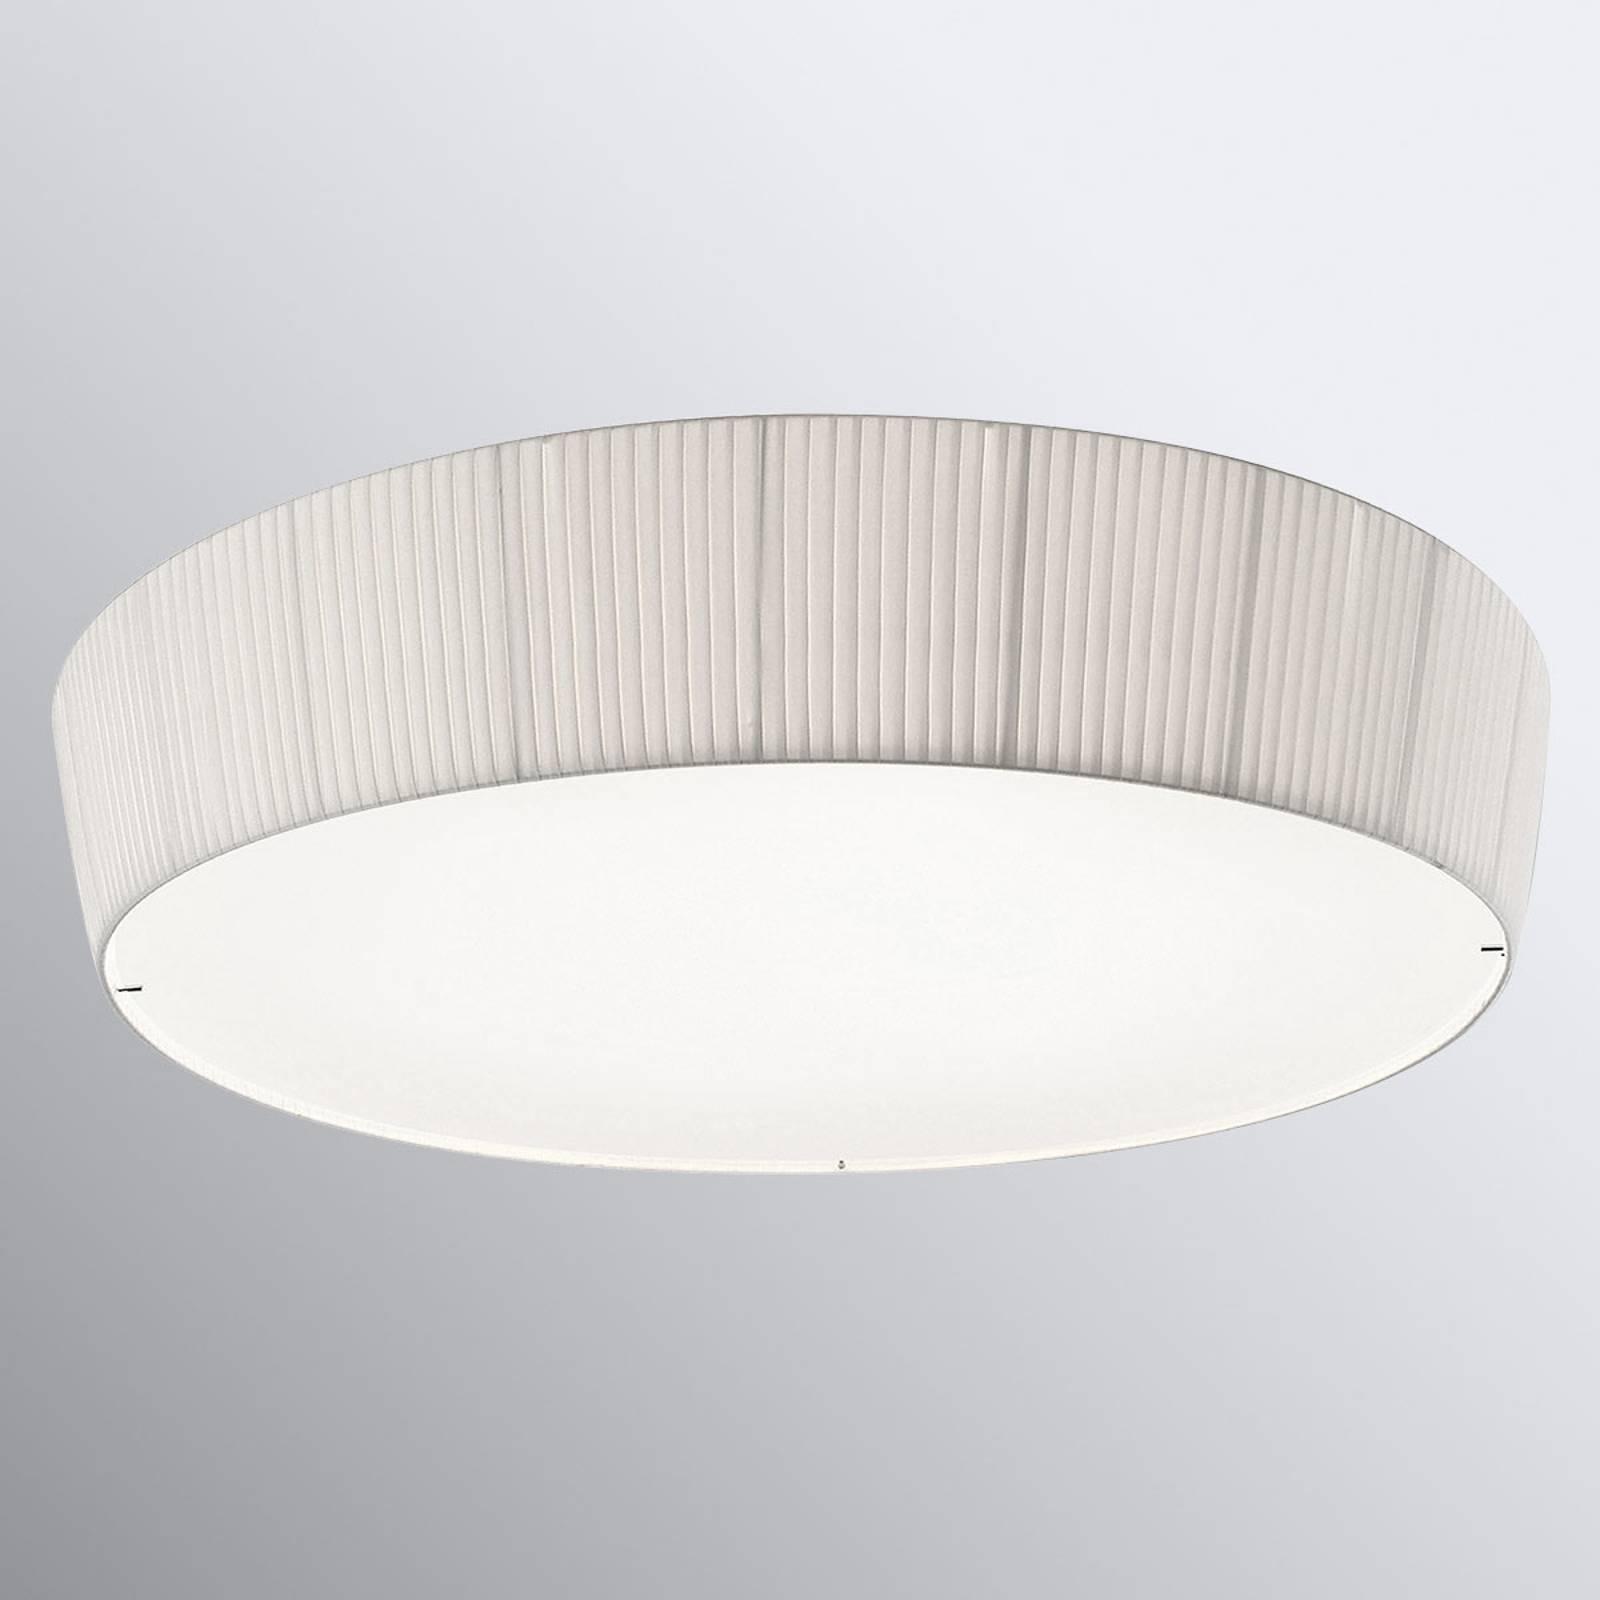 Bover Plafonet 95 - Textil-Deckenlampe, Band weiß